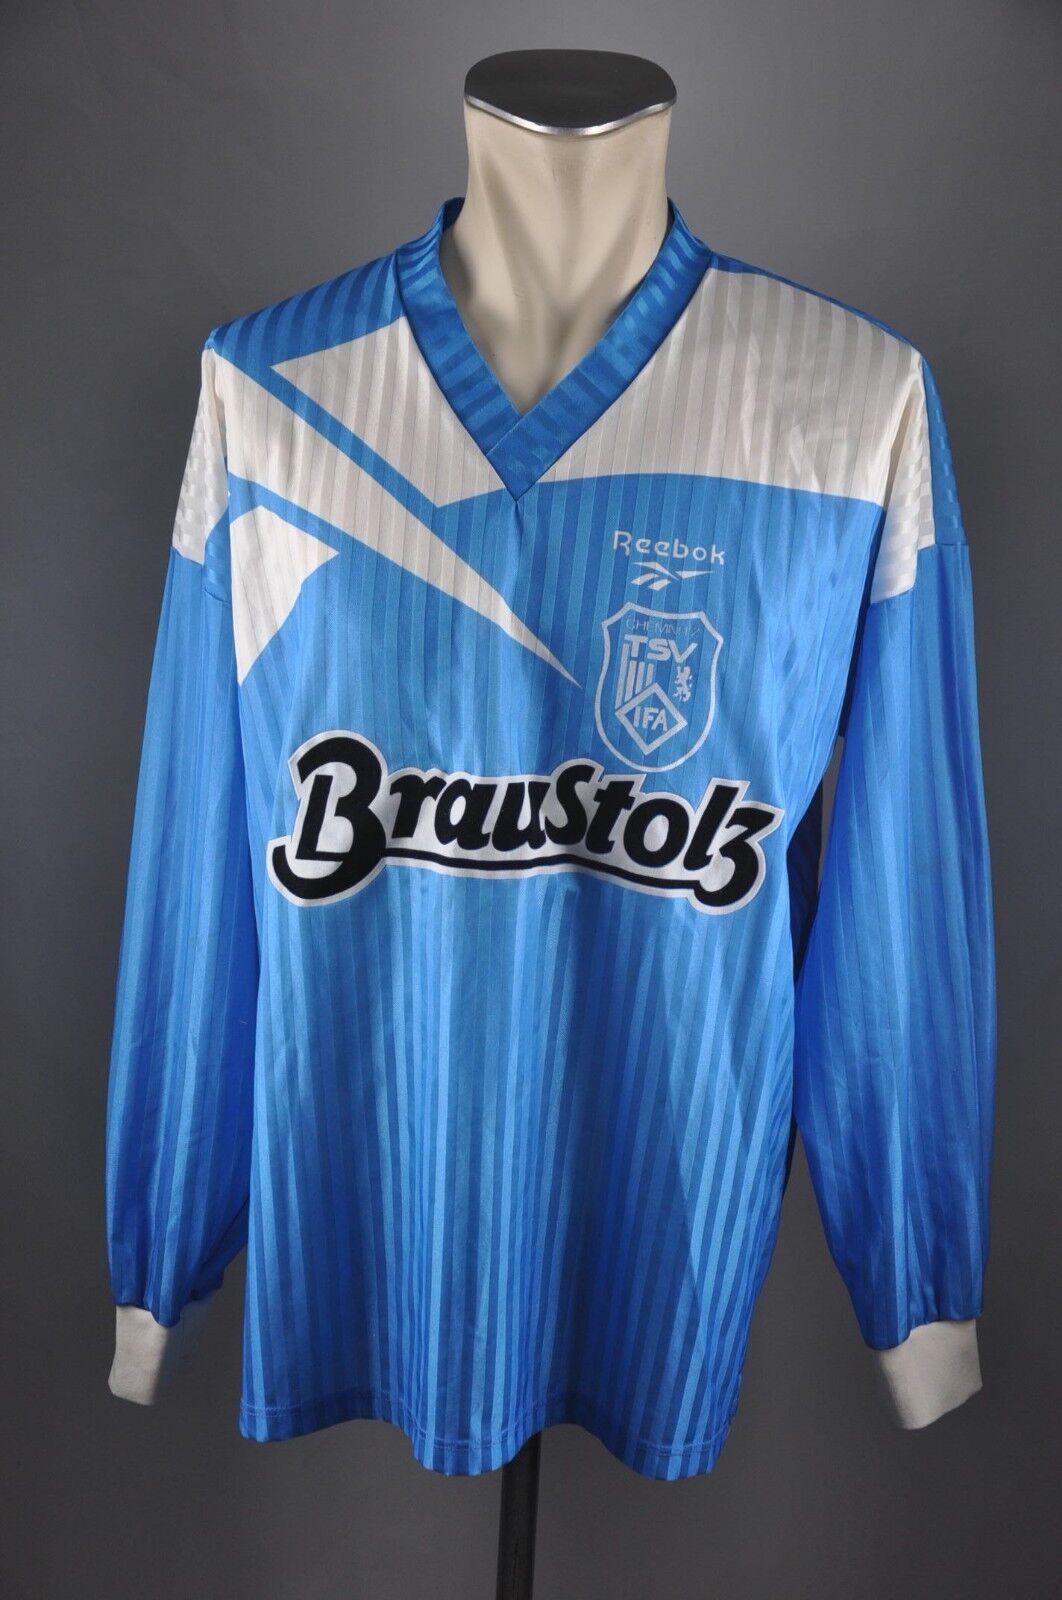 TSV Chemnitz IFA Trikot Gr. L Jersey Reebok 90er blau Braustolz  14 DDR LS